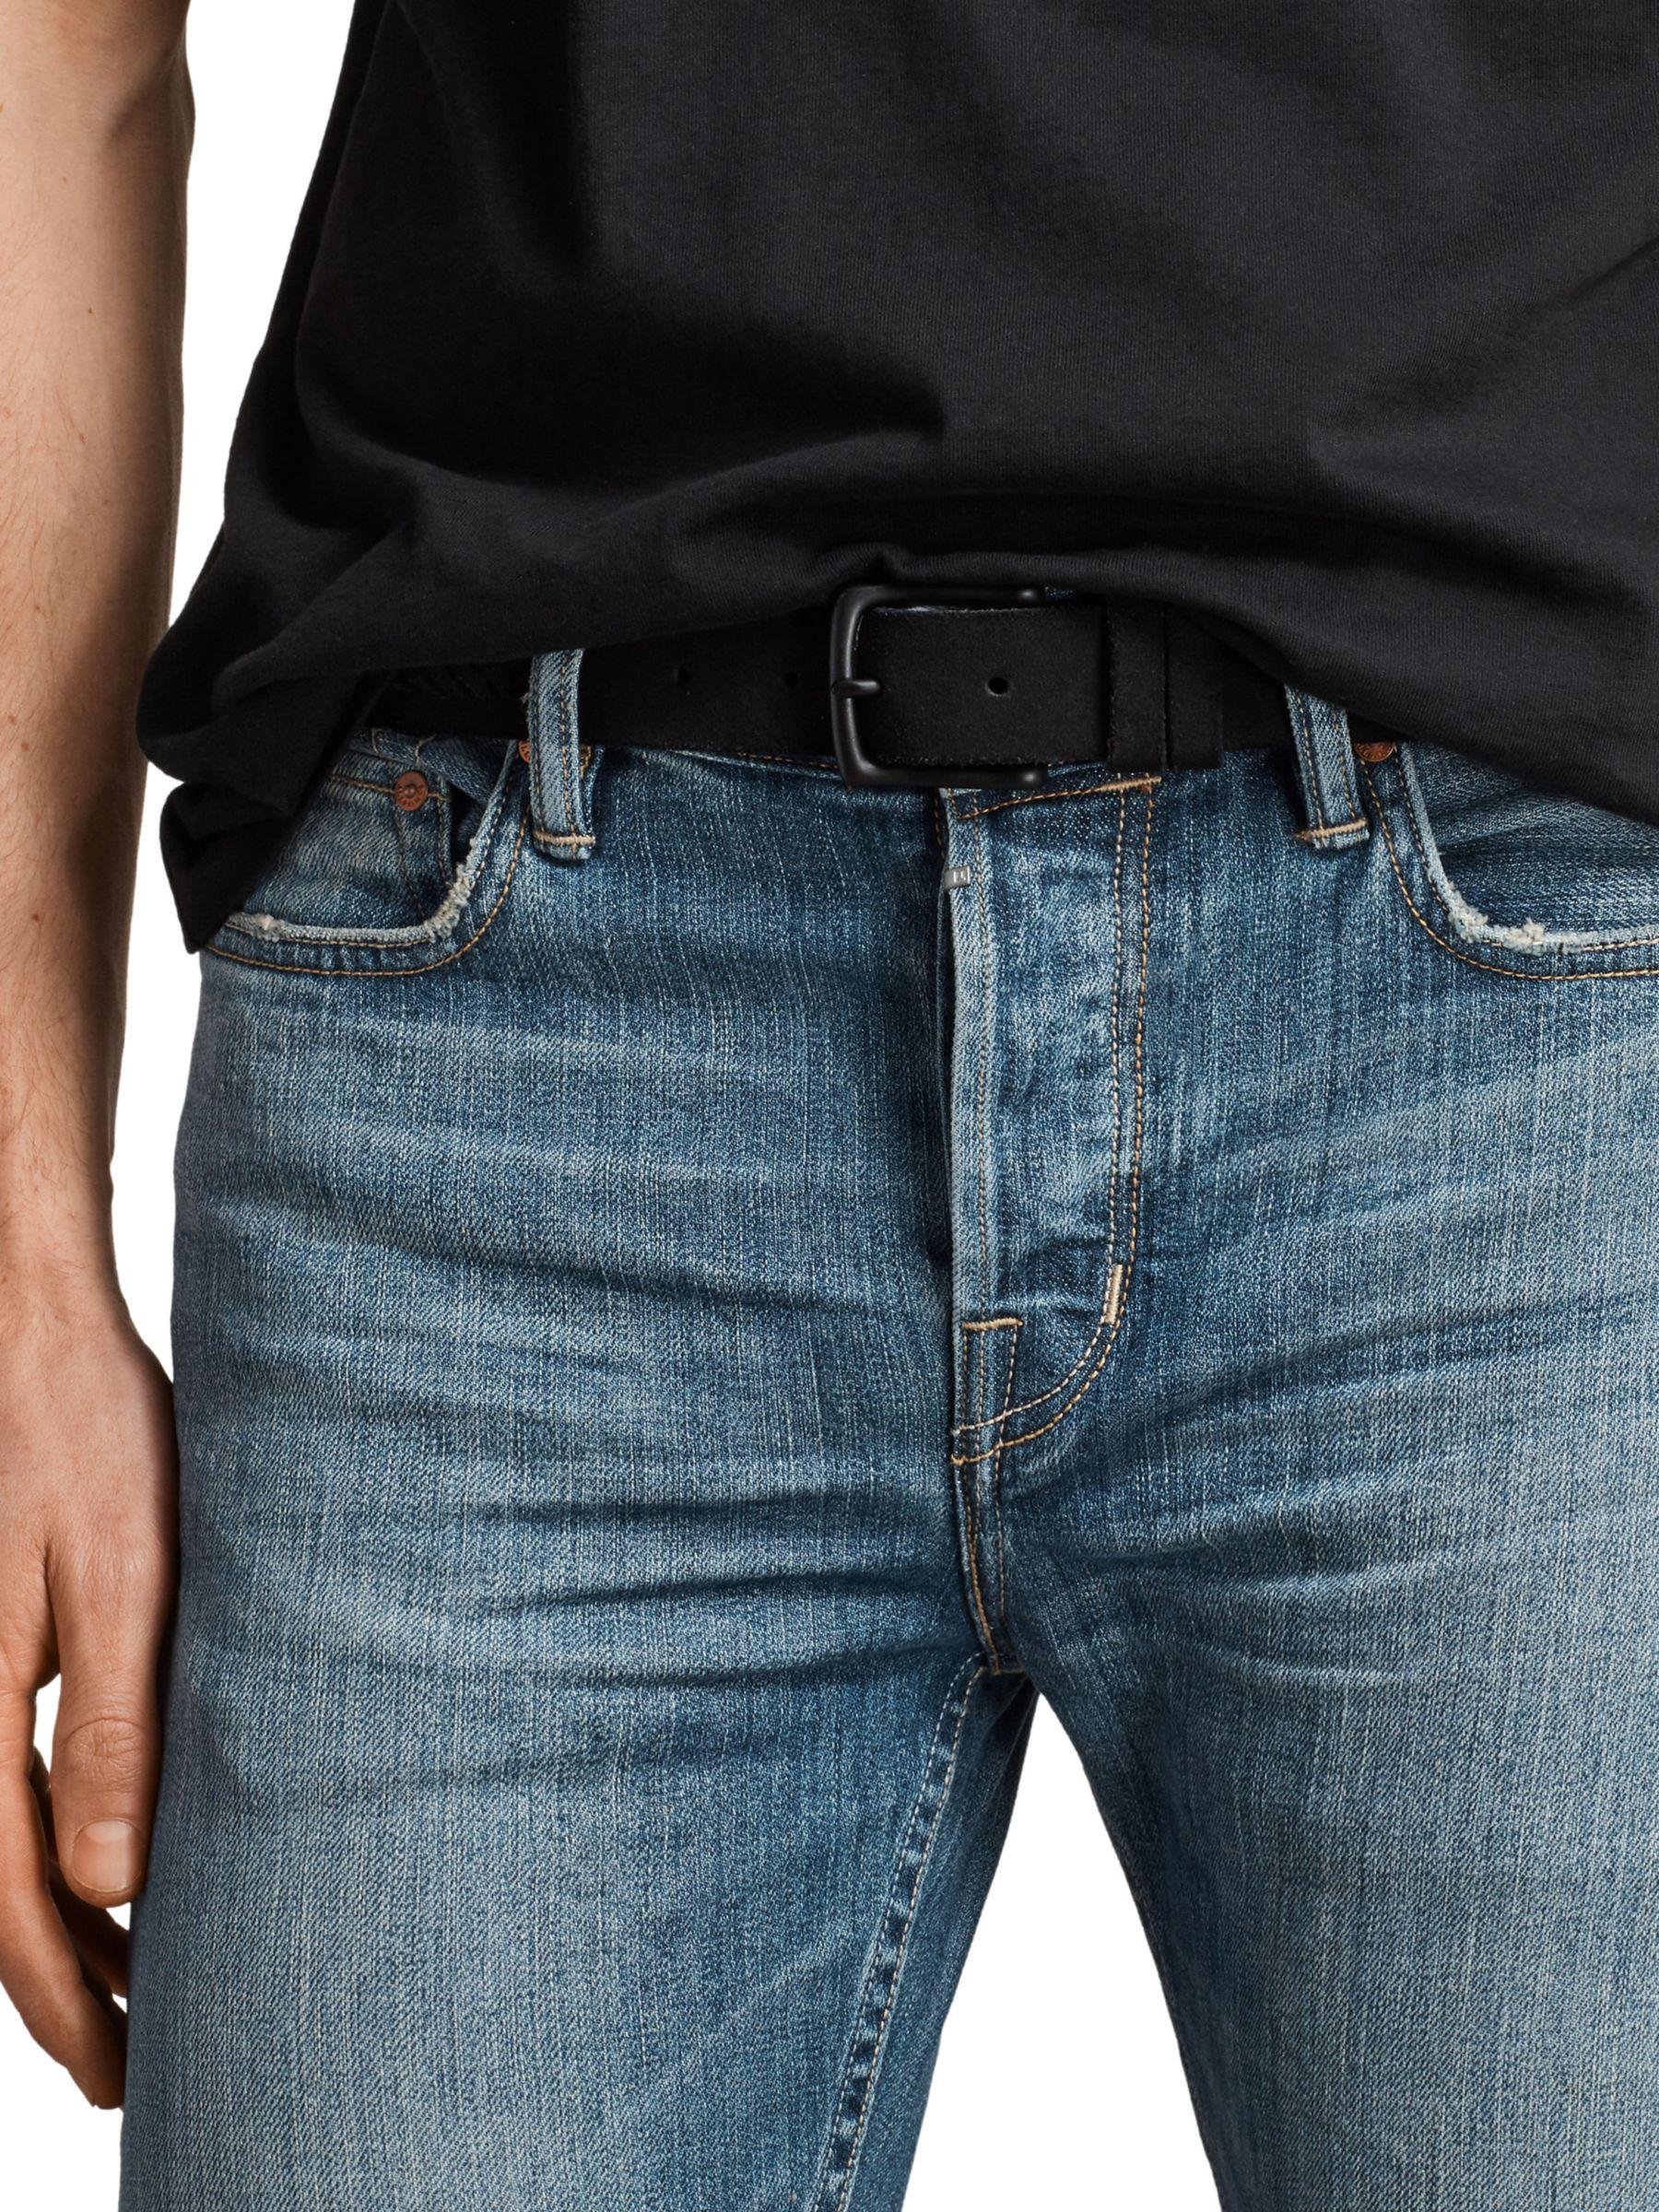 AllSaints Denim Ione Cigarette Skinny Fit Jeans in Indigo (Blue) for Men